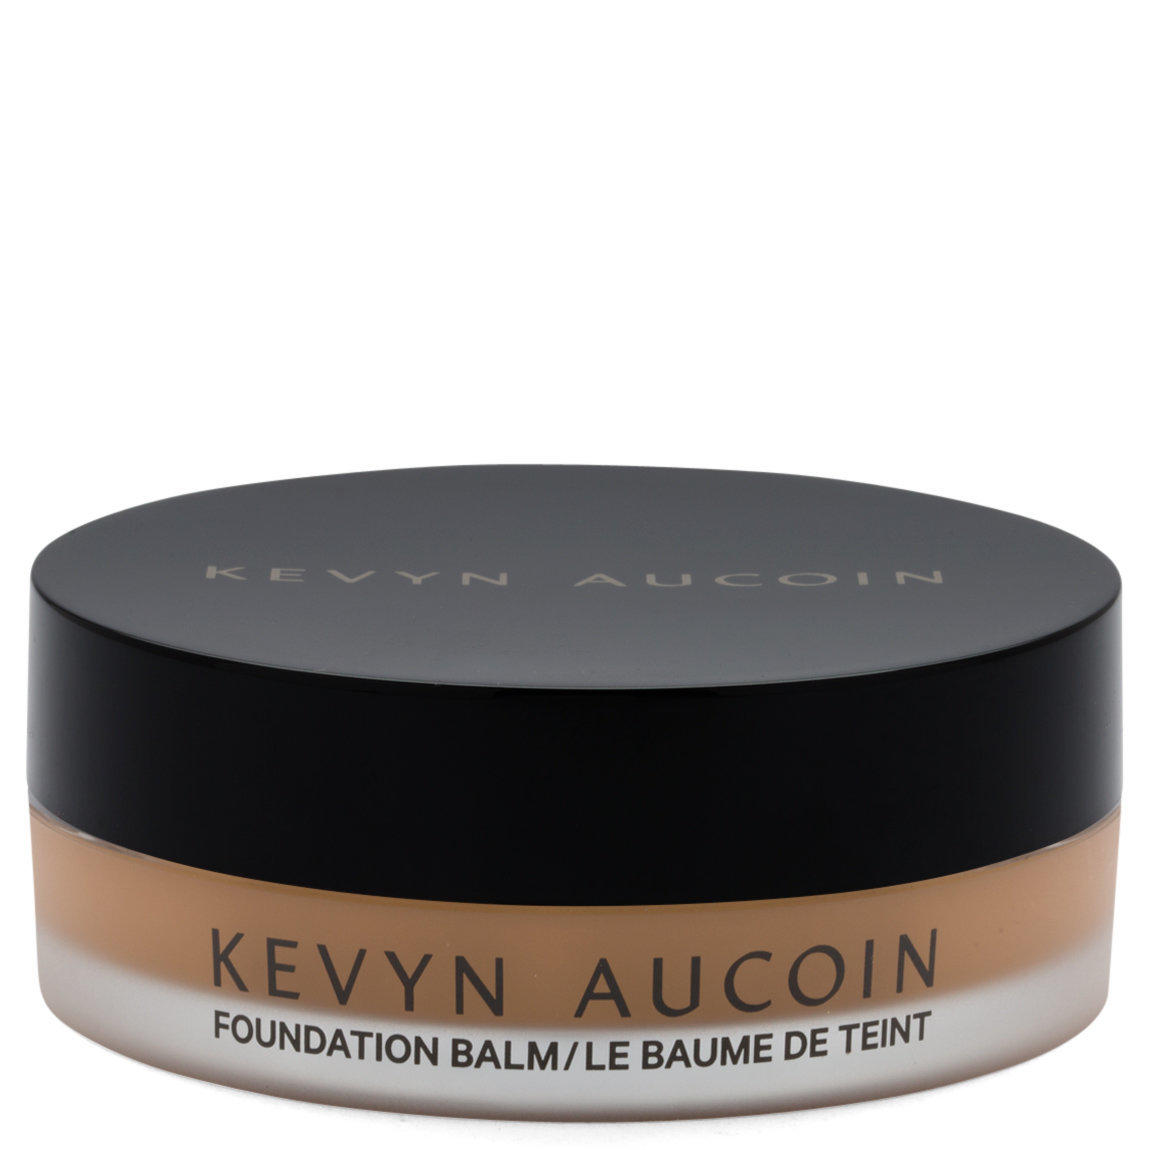 Kevyn Aucoin Foundation Balm Deep FB12